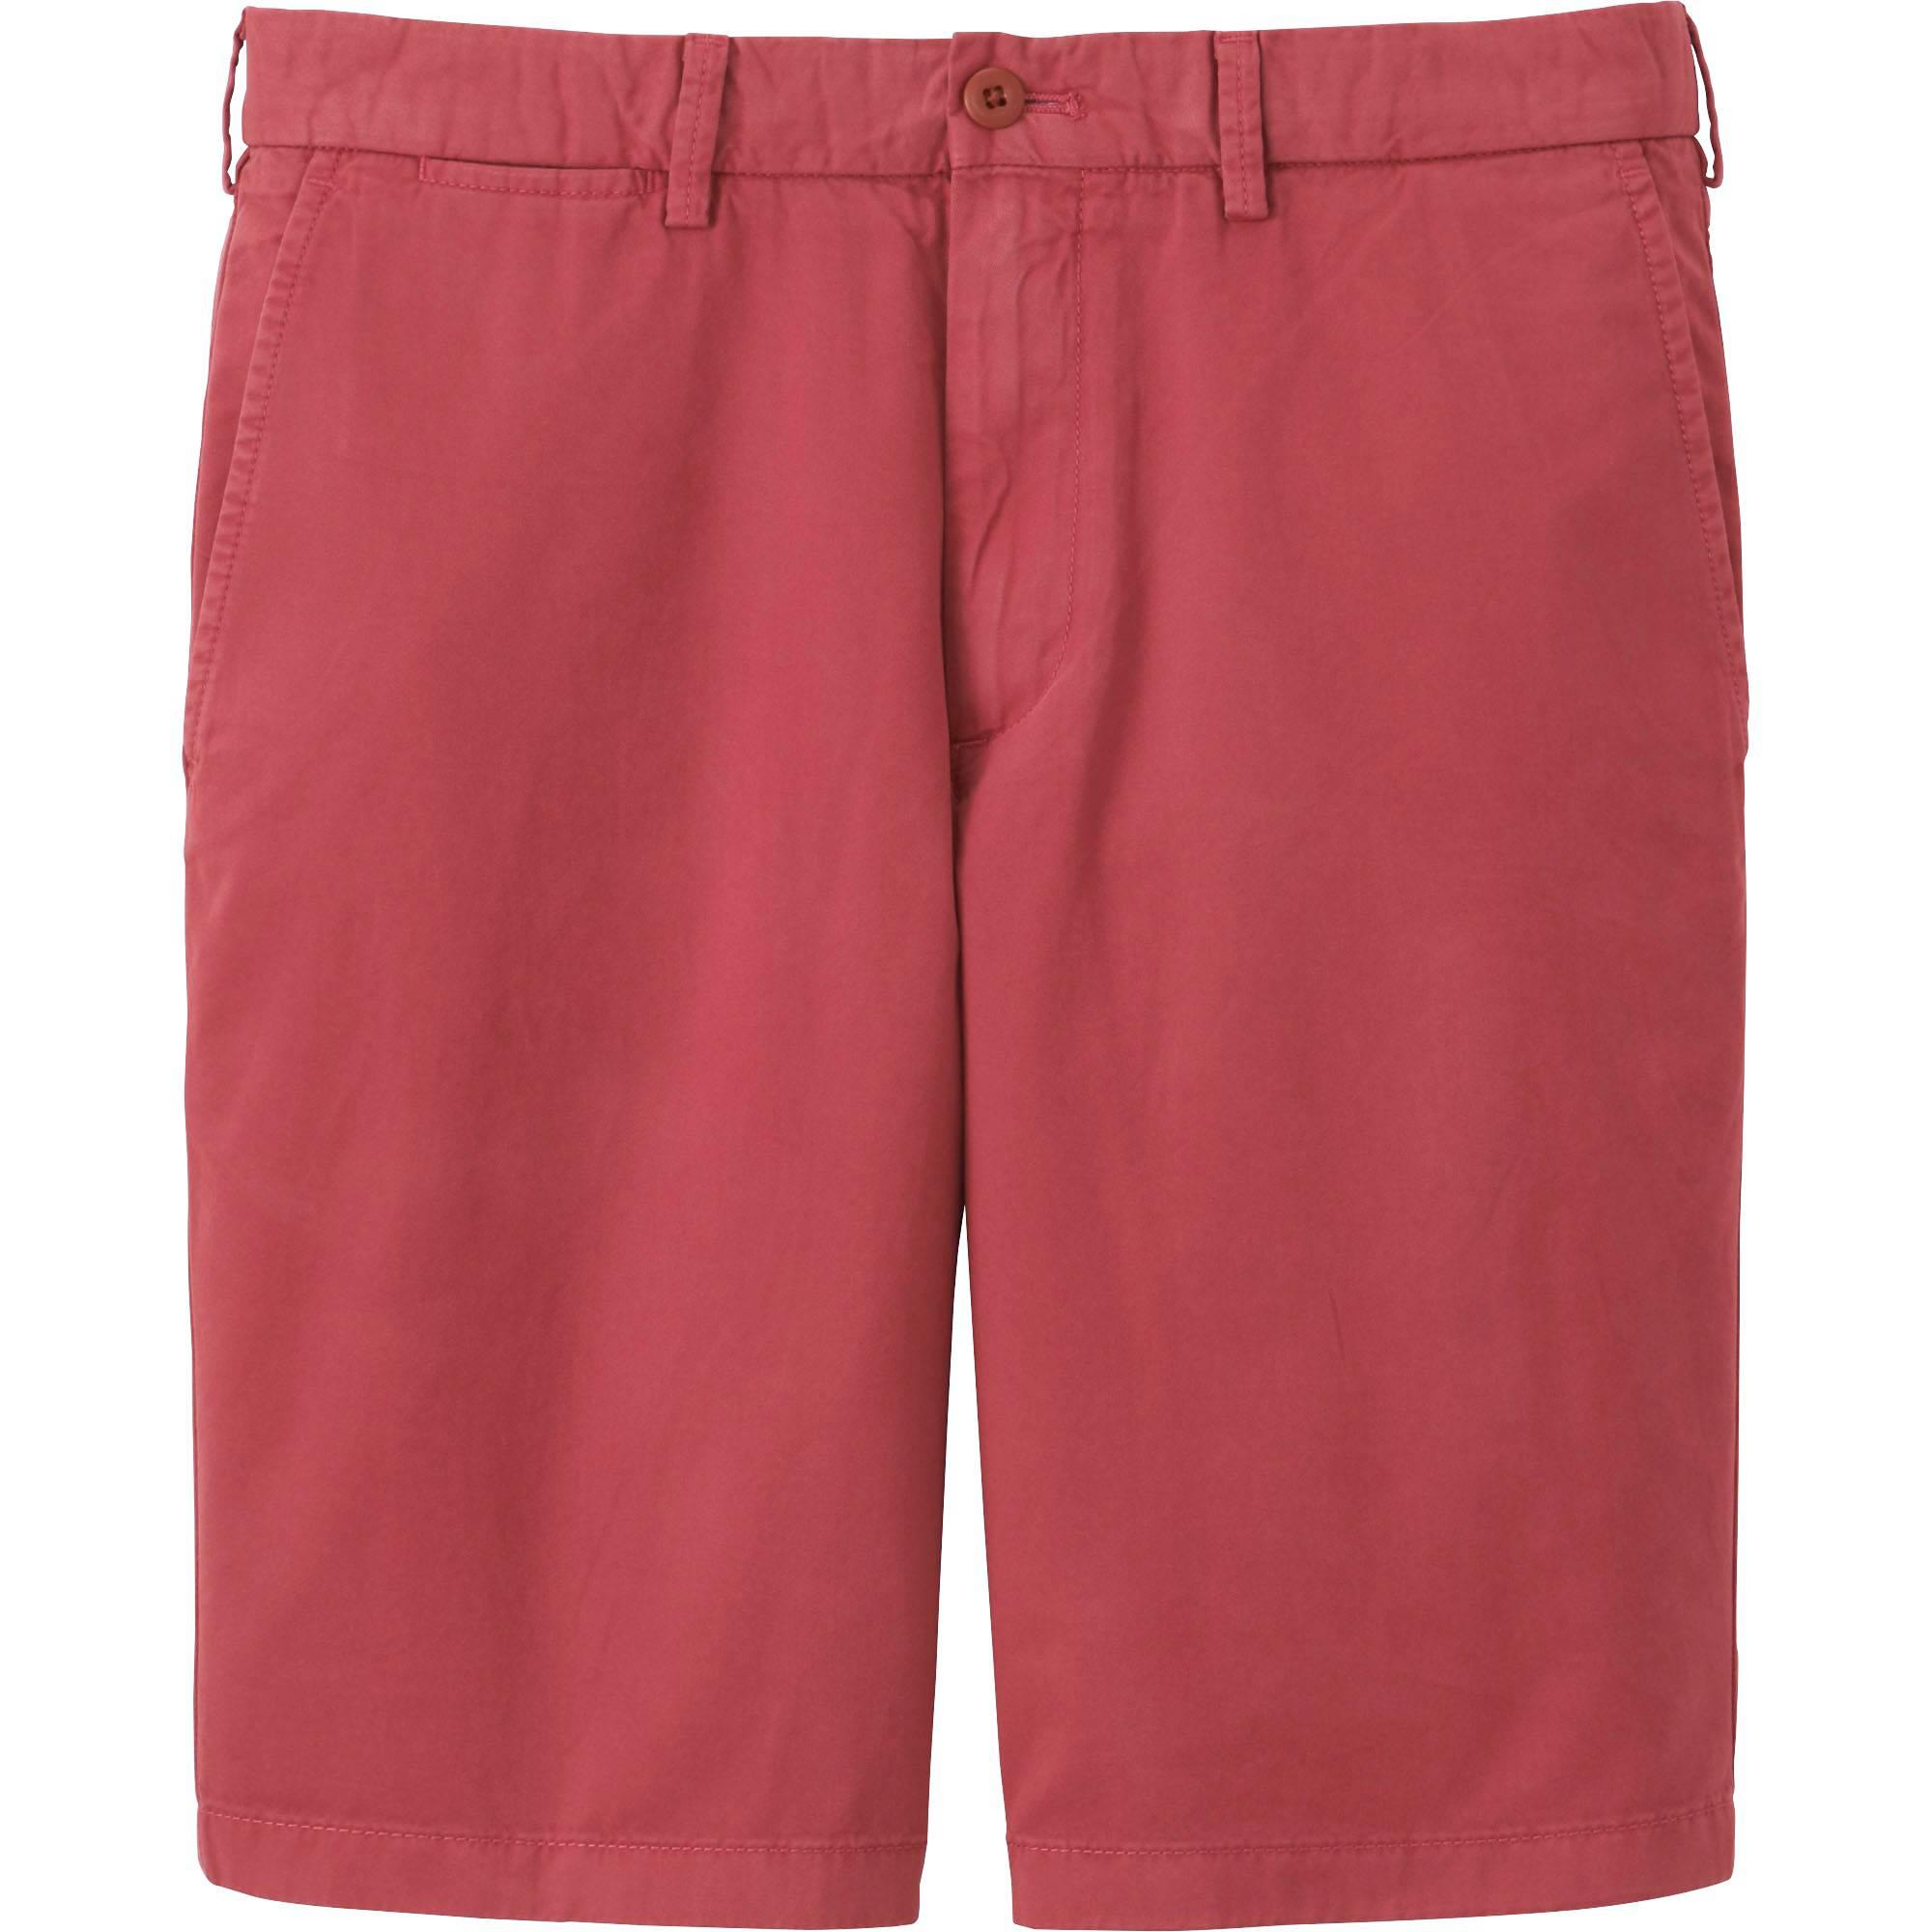 mens chino shorts men chino shorts, wine, small VLFWJUN